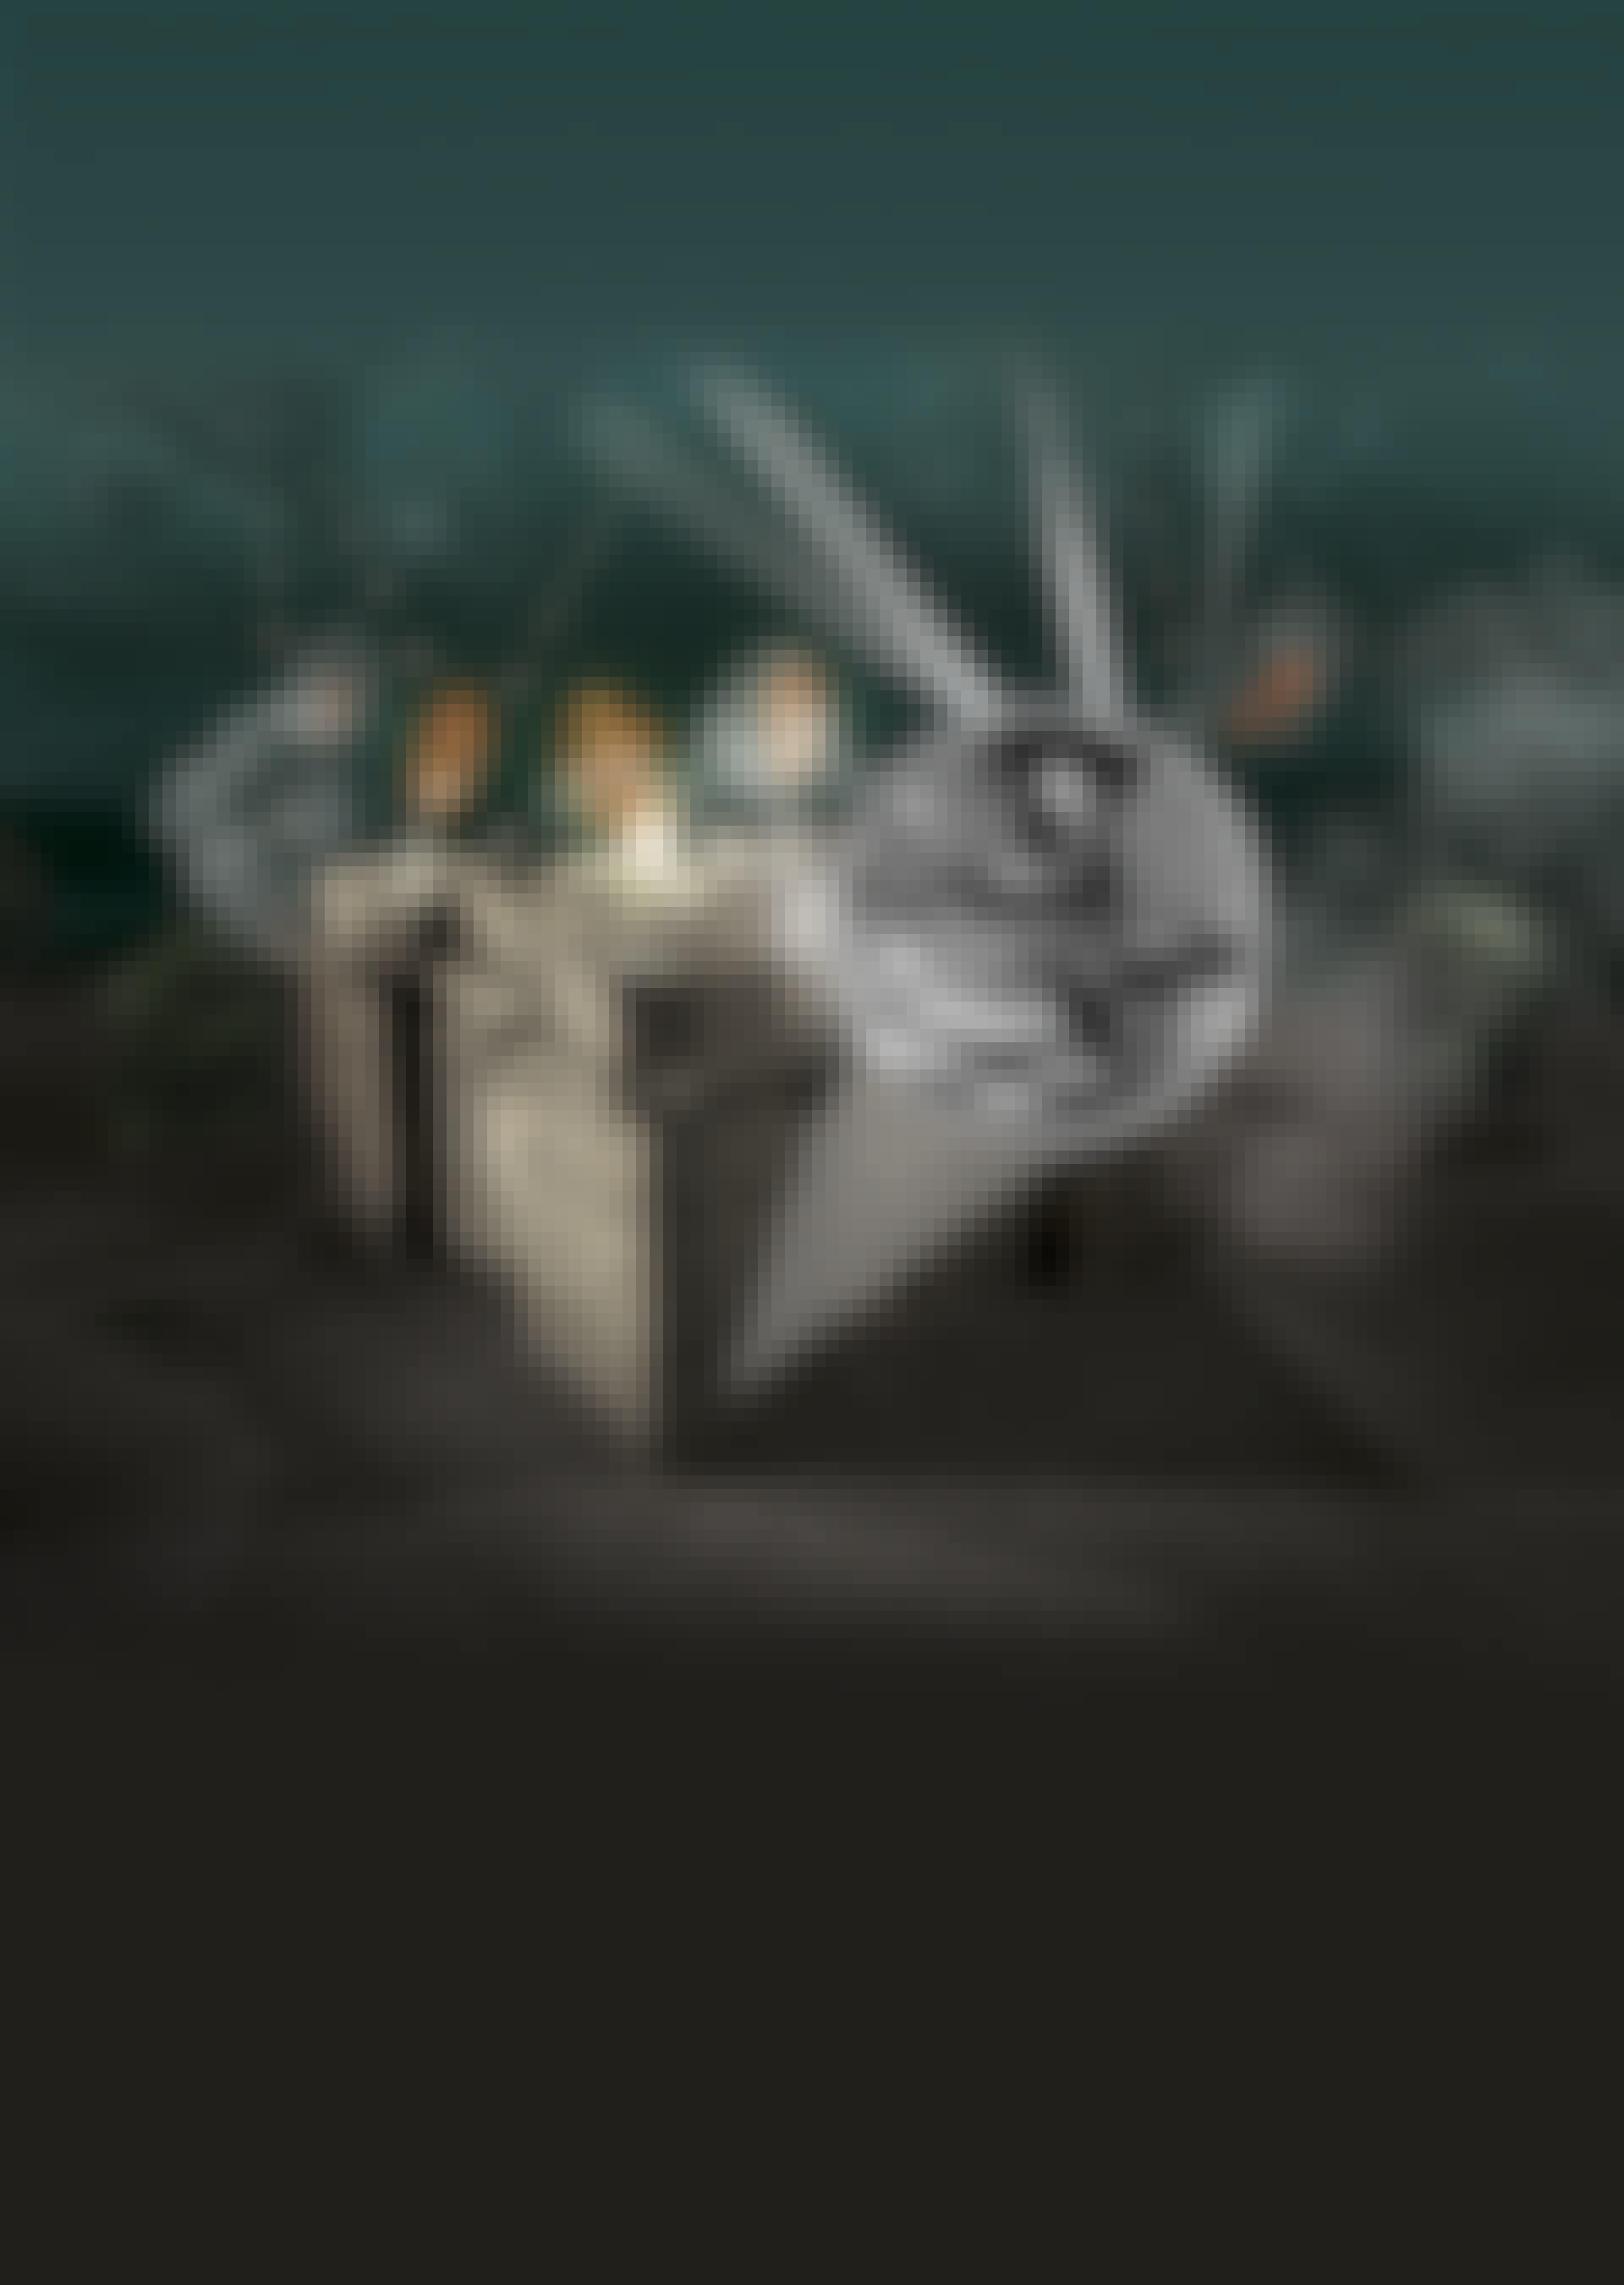 ammunitionslager flaktorn